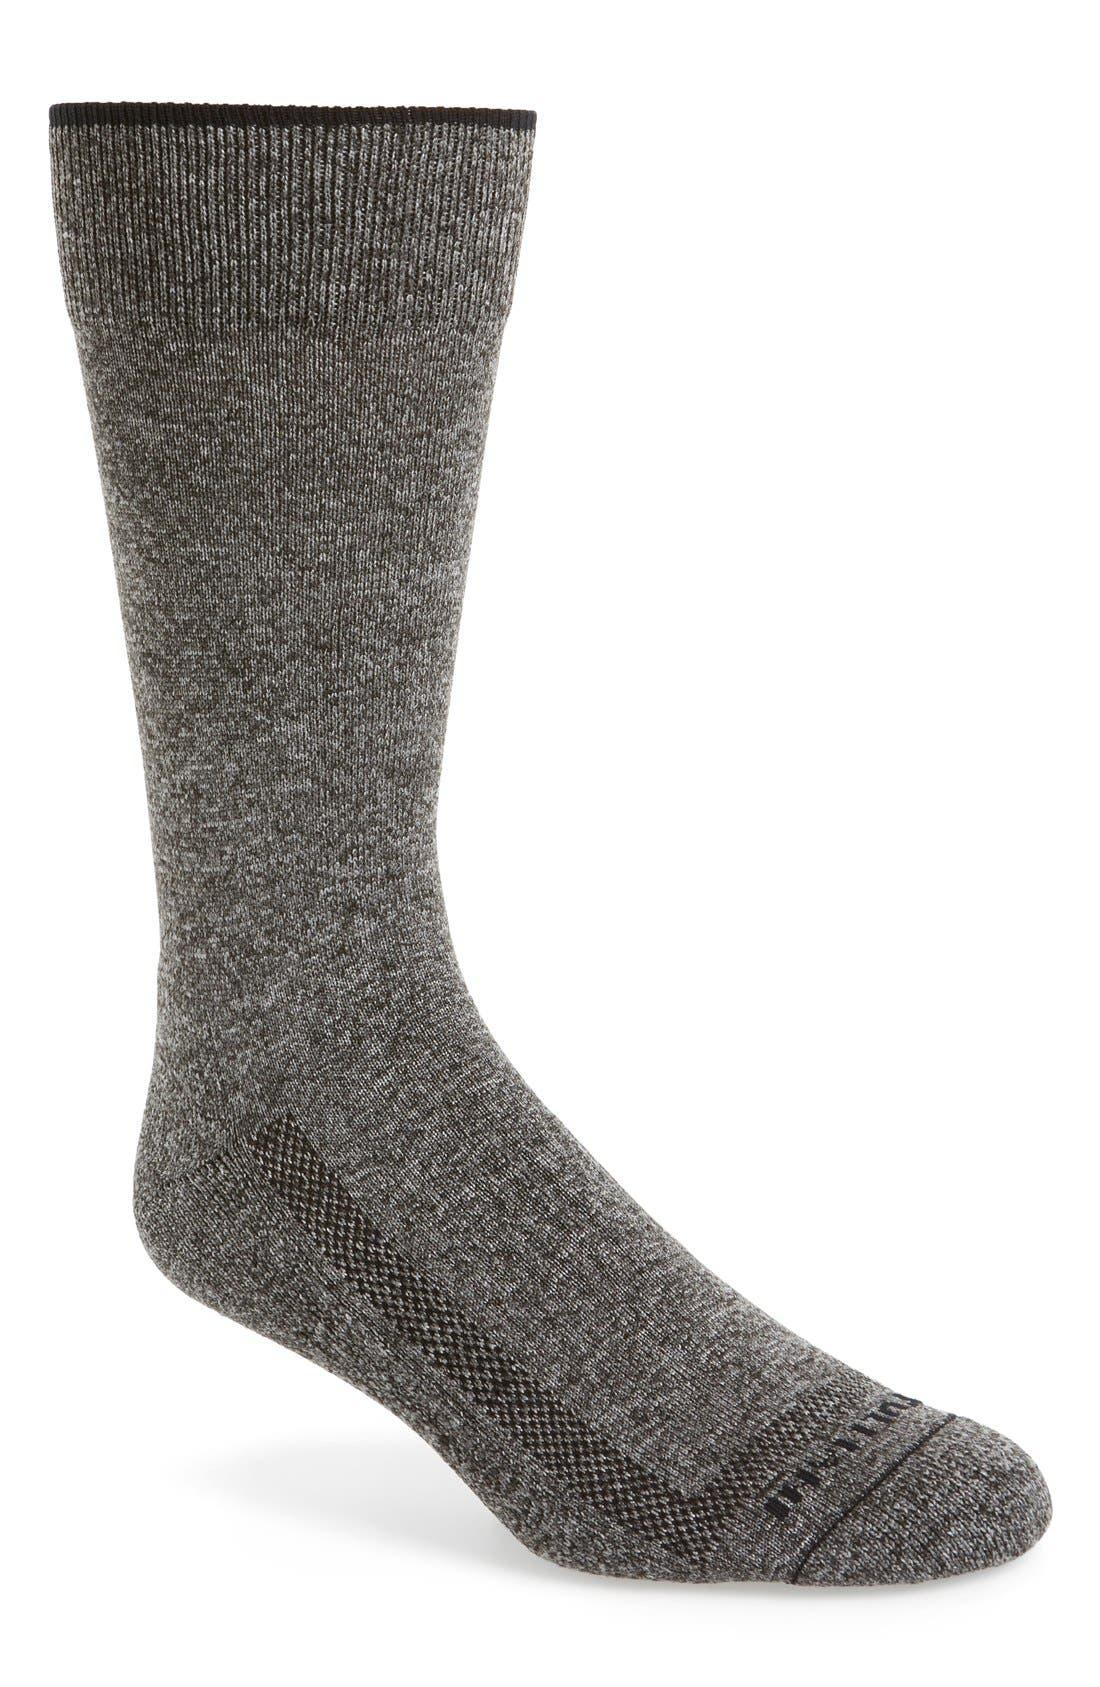 'Pima' Socks, Main, color, 020